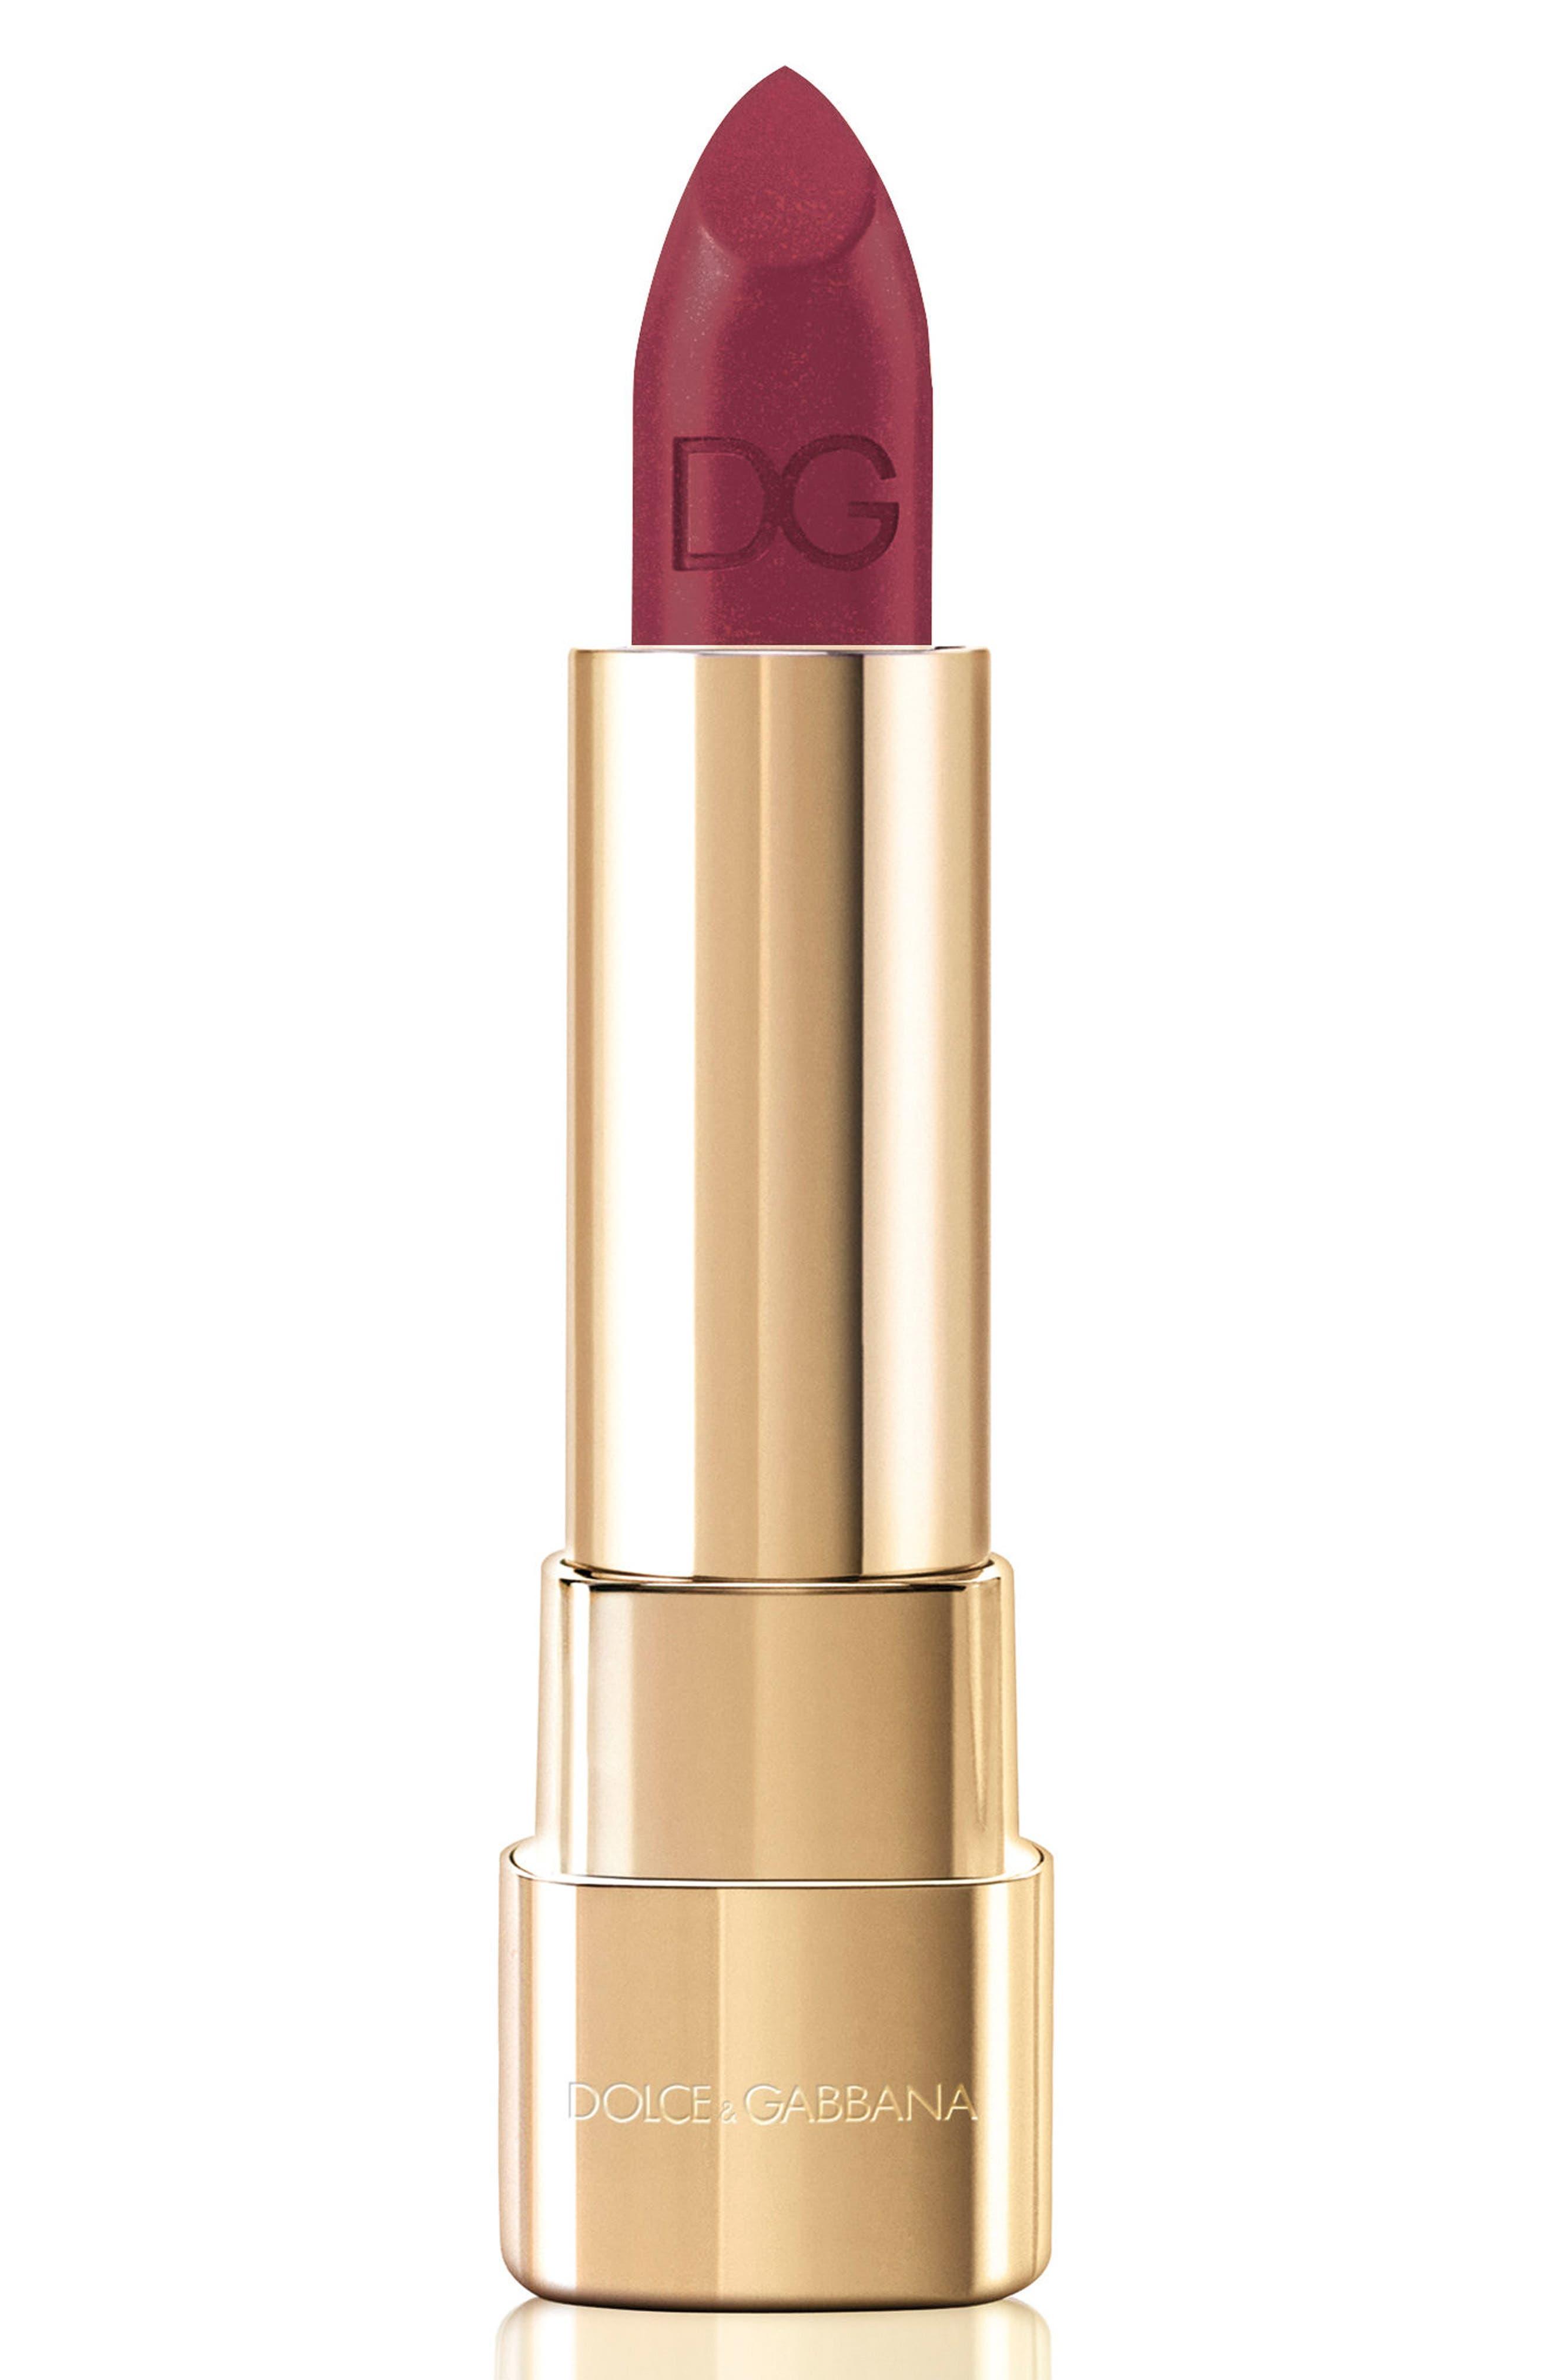 Alternate Image 1 Selected - Dolce&Gabbana Beauty Shine Lipstick